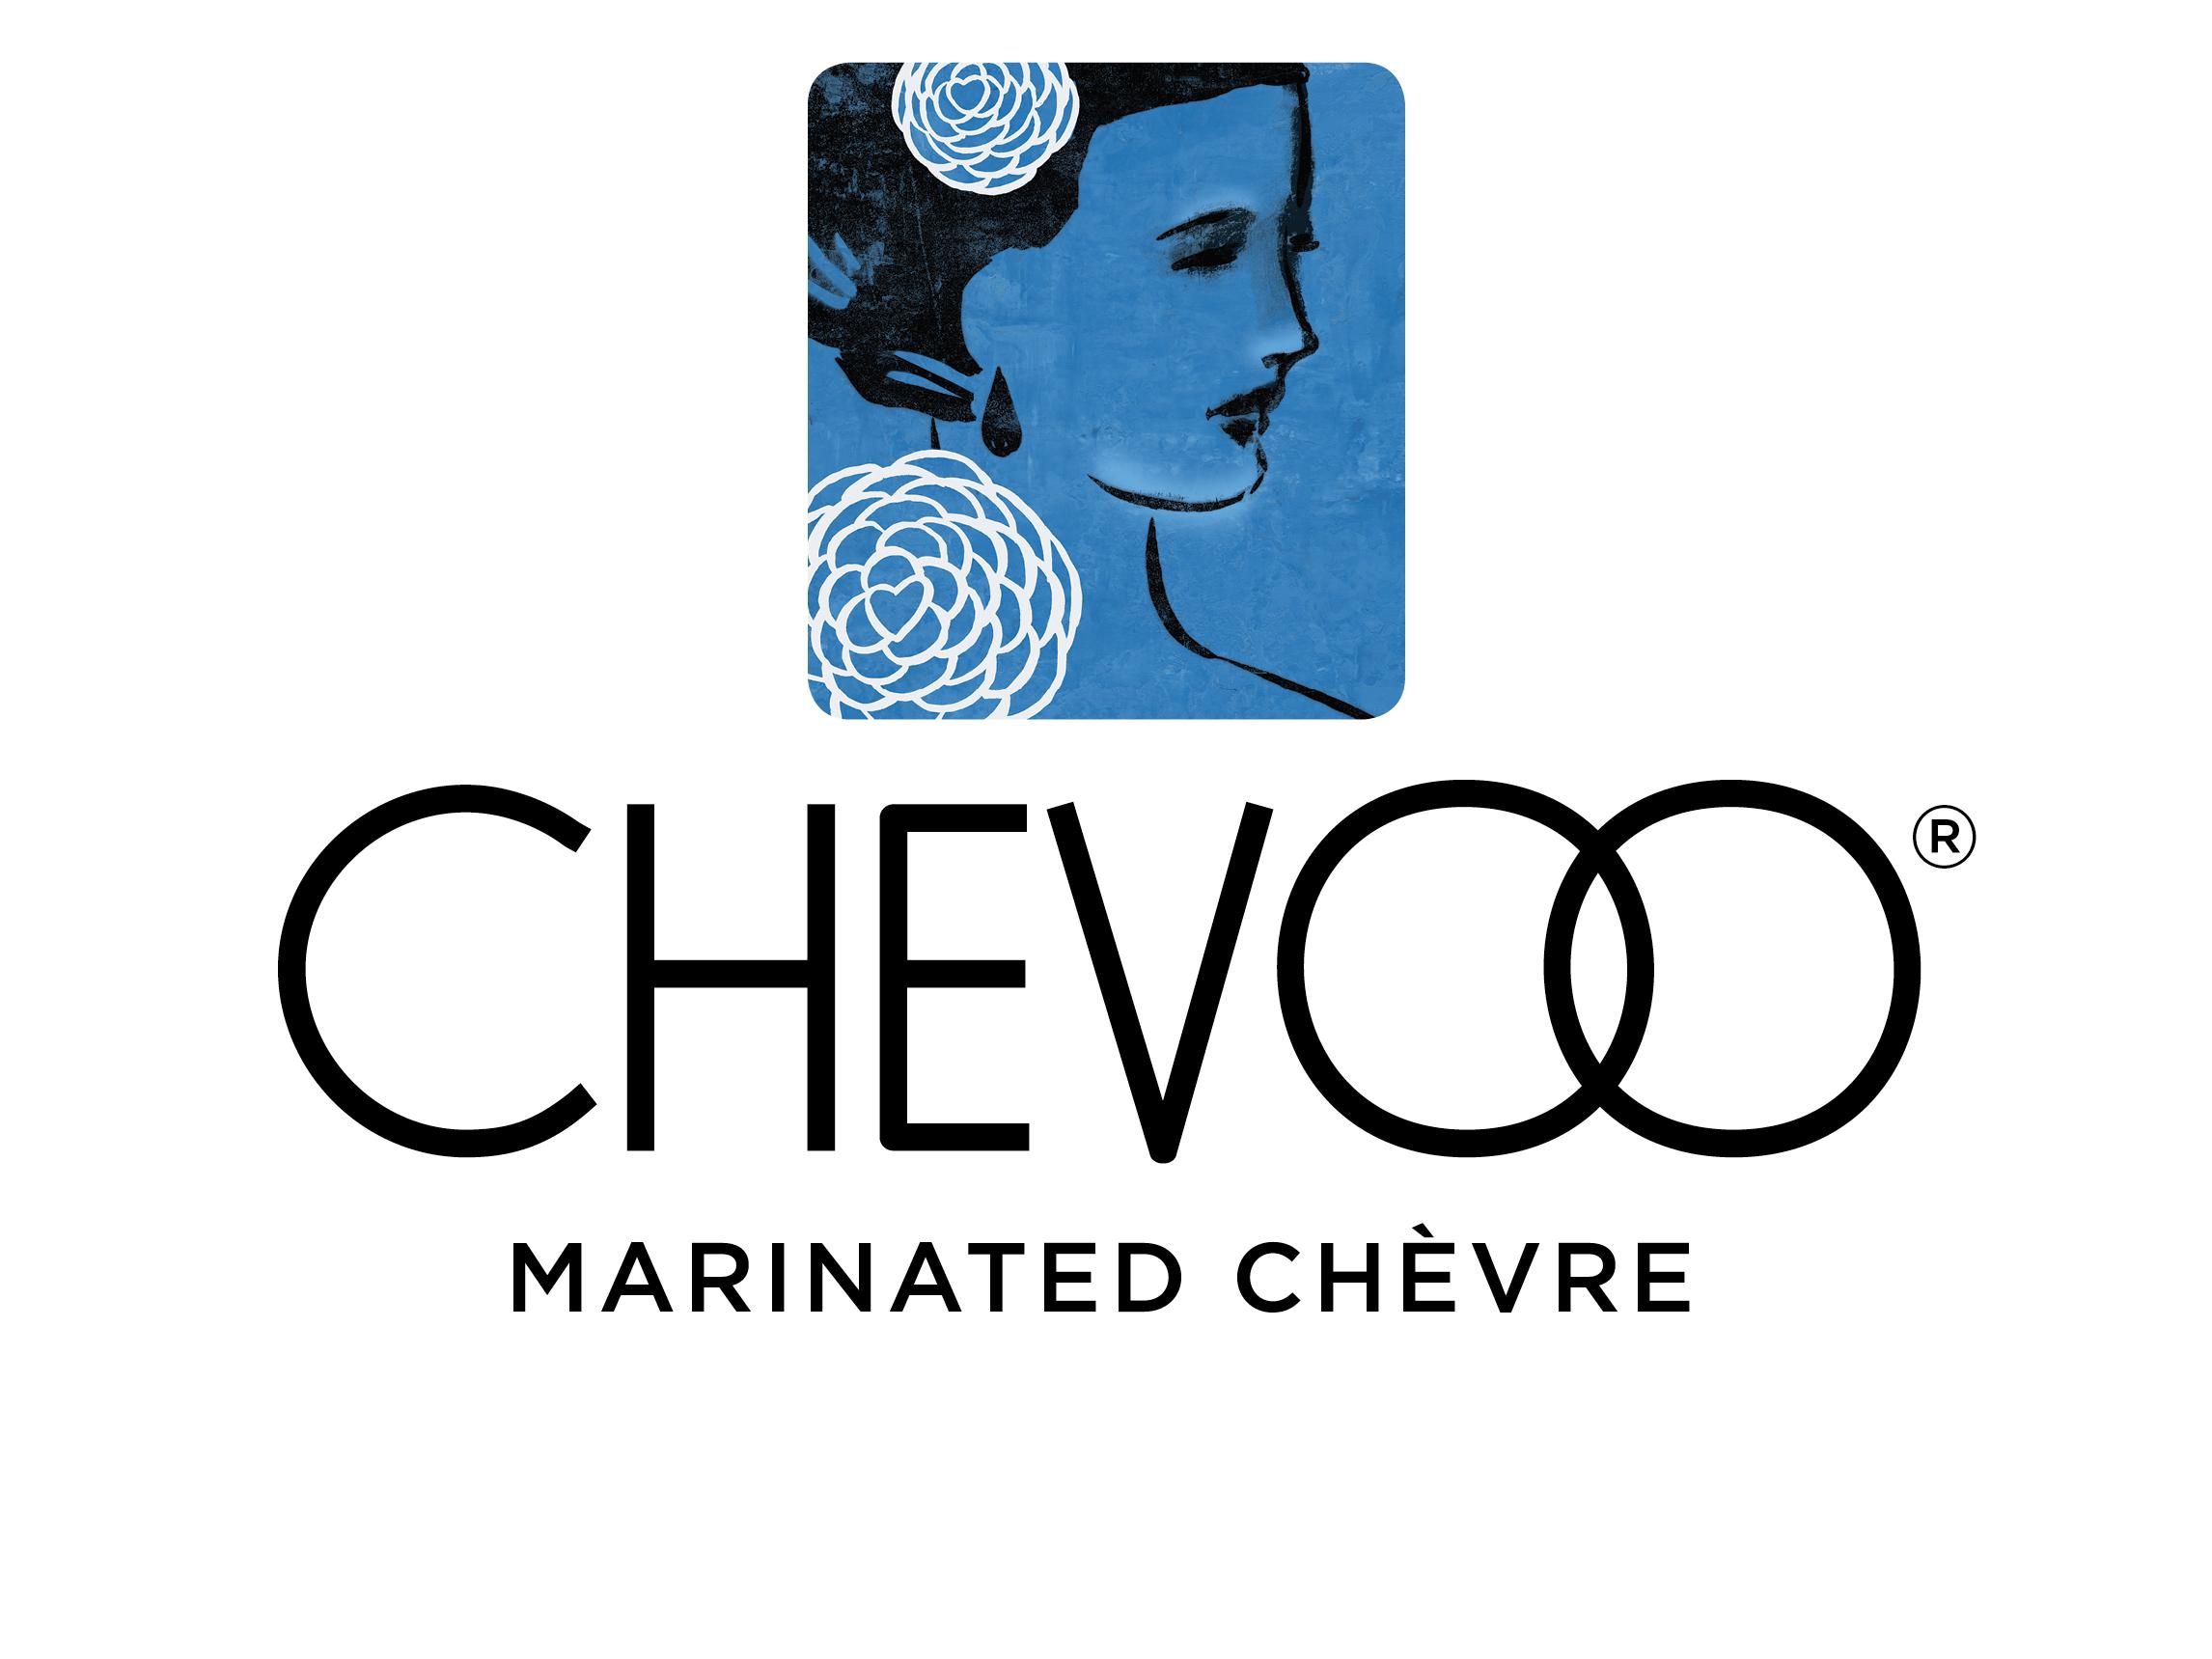 DMD_Logos_CHEVOO_150.jpg